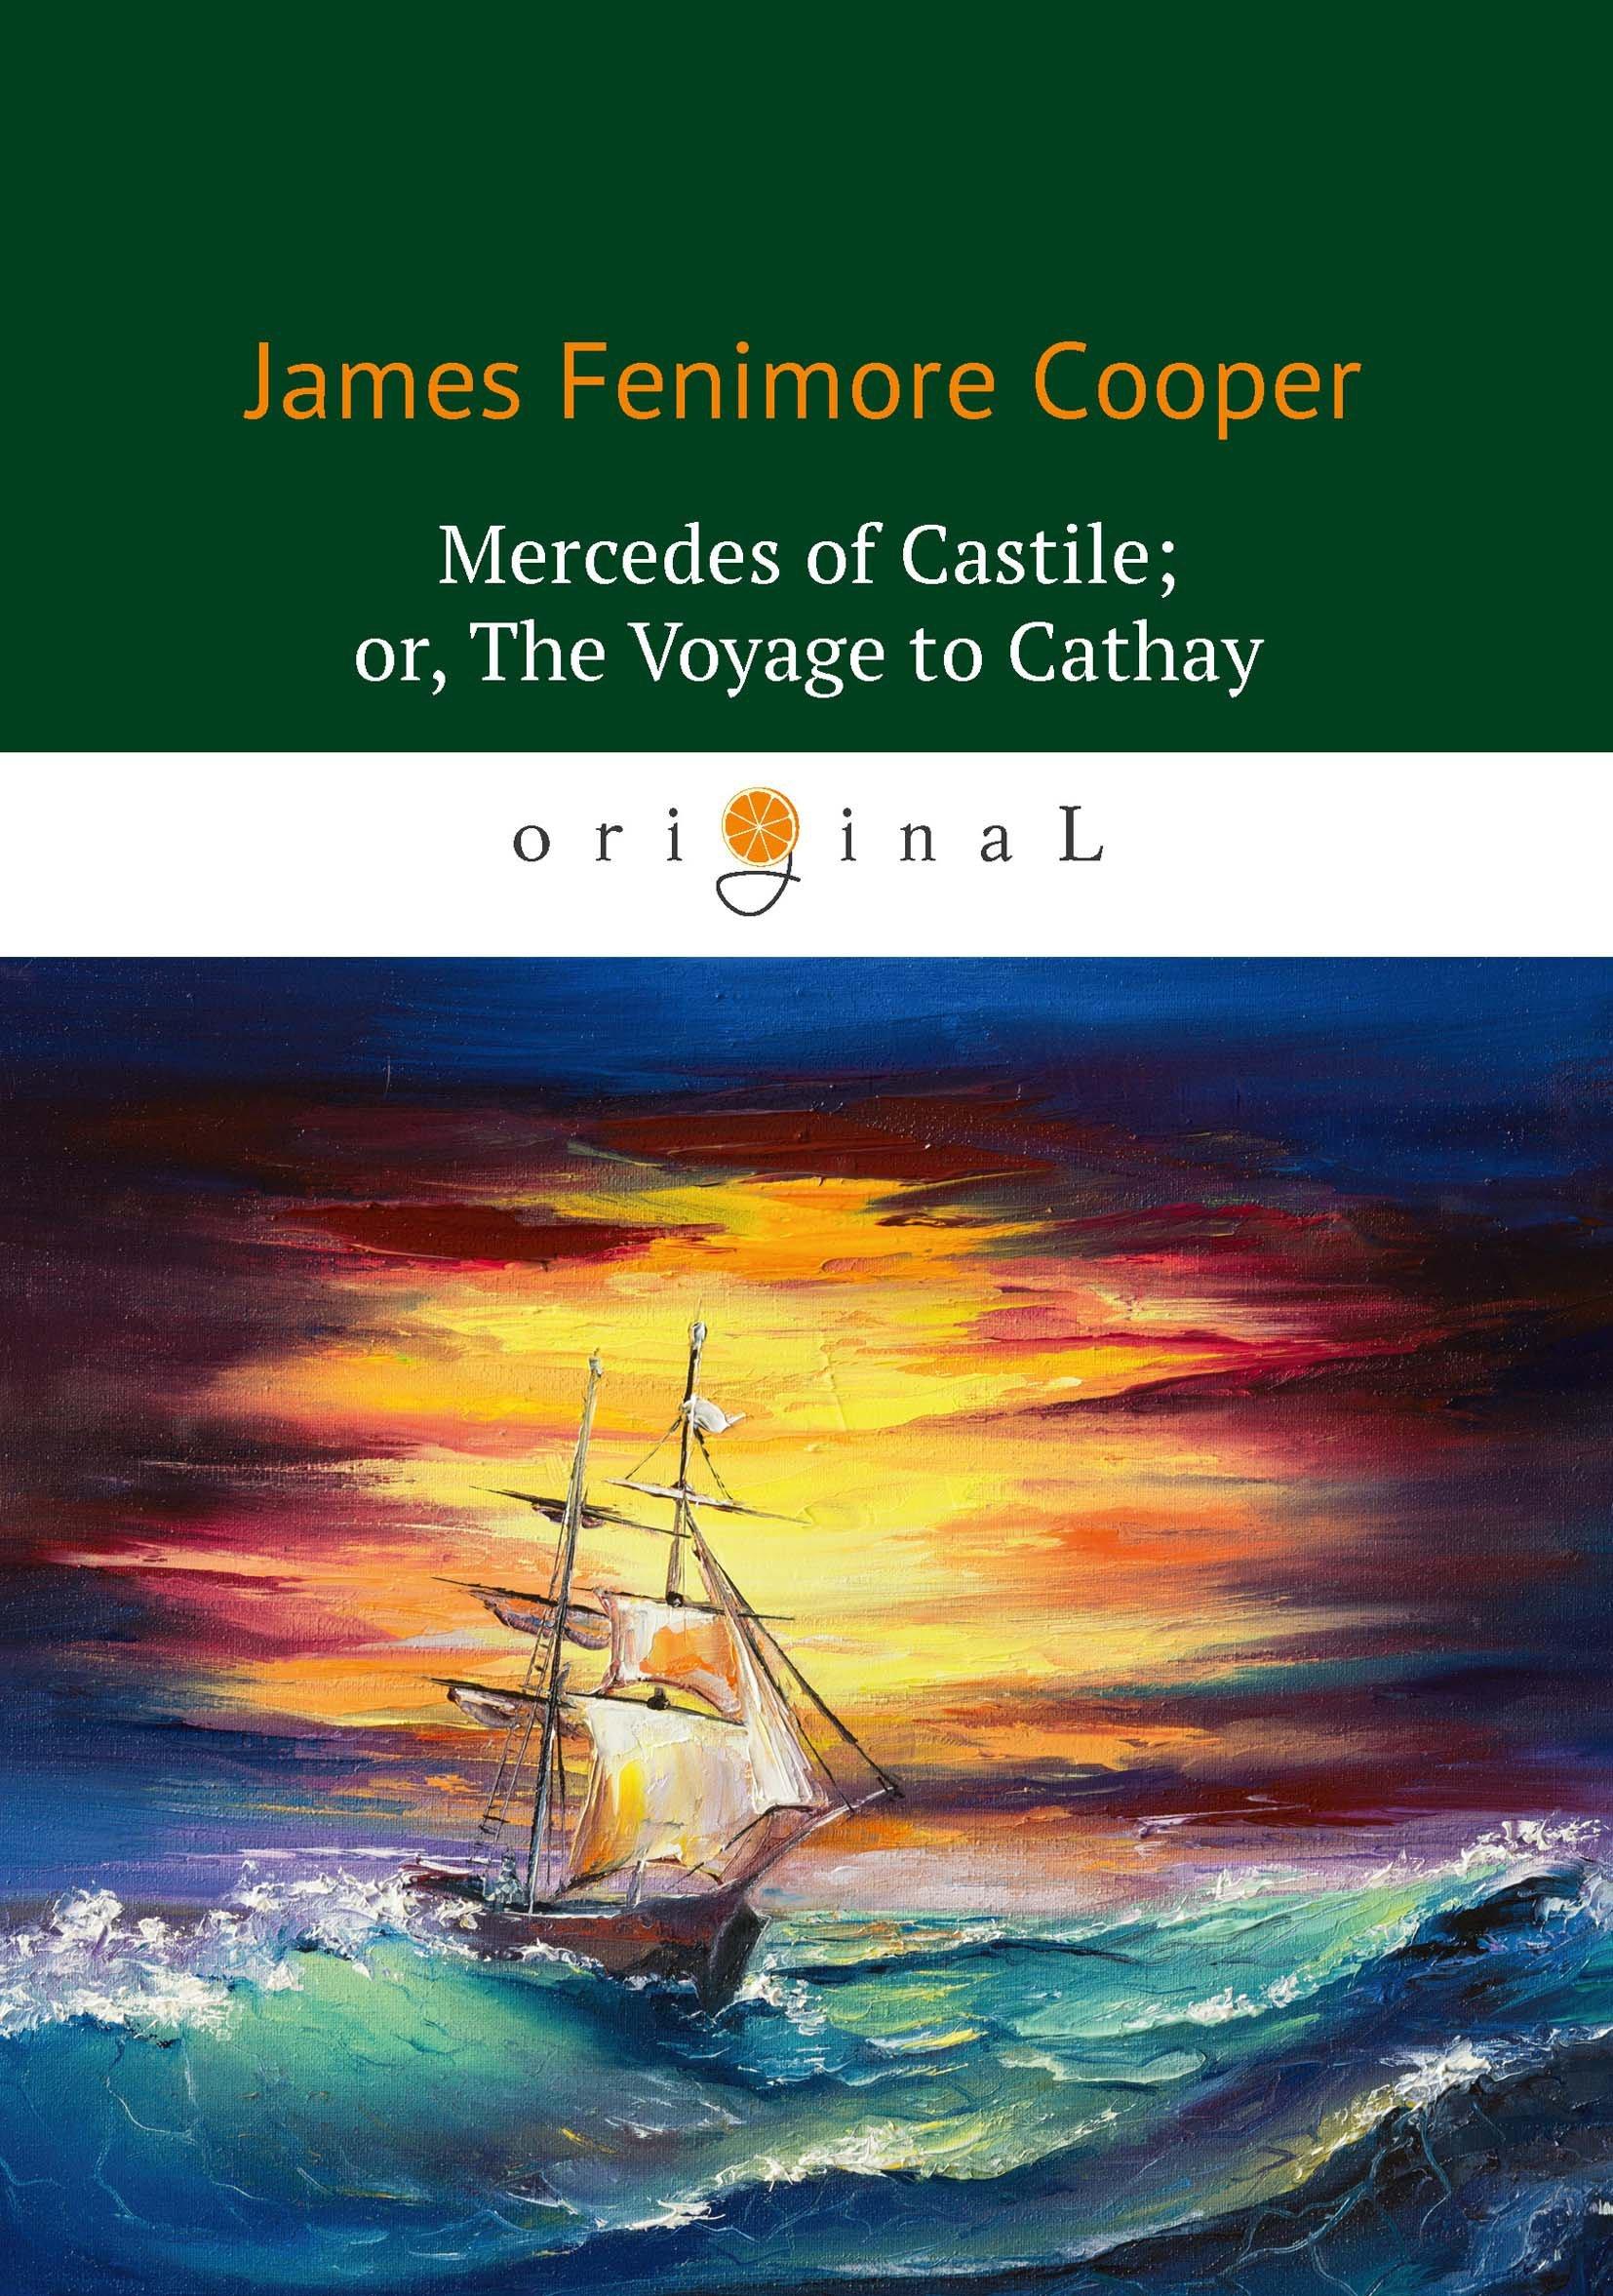 Купер Джеймс Фенимор Mercedes of Castile; or, The Voyage to Cathay = Мерседес из Кастилии, или Путешествие в Катай: роман на англ.яз недорого